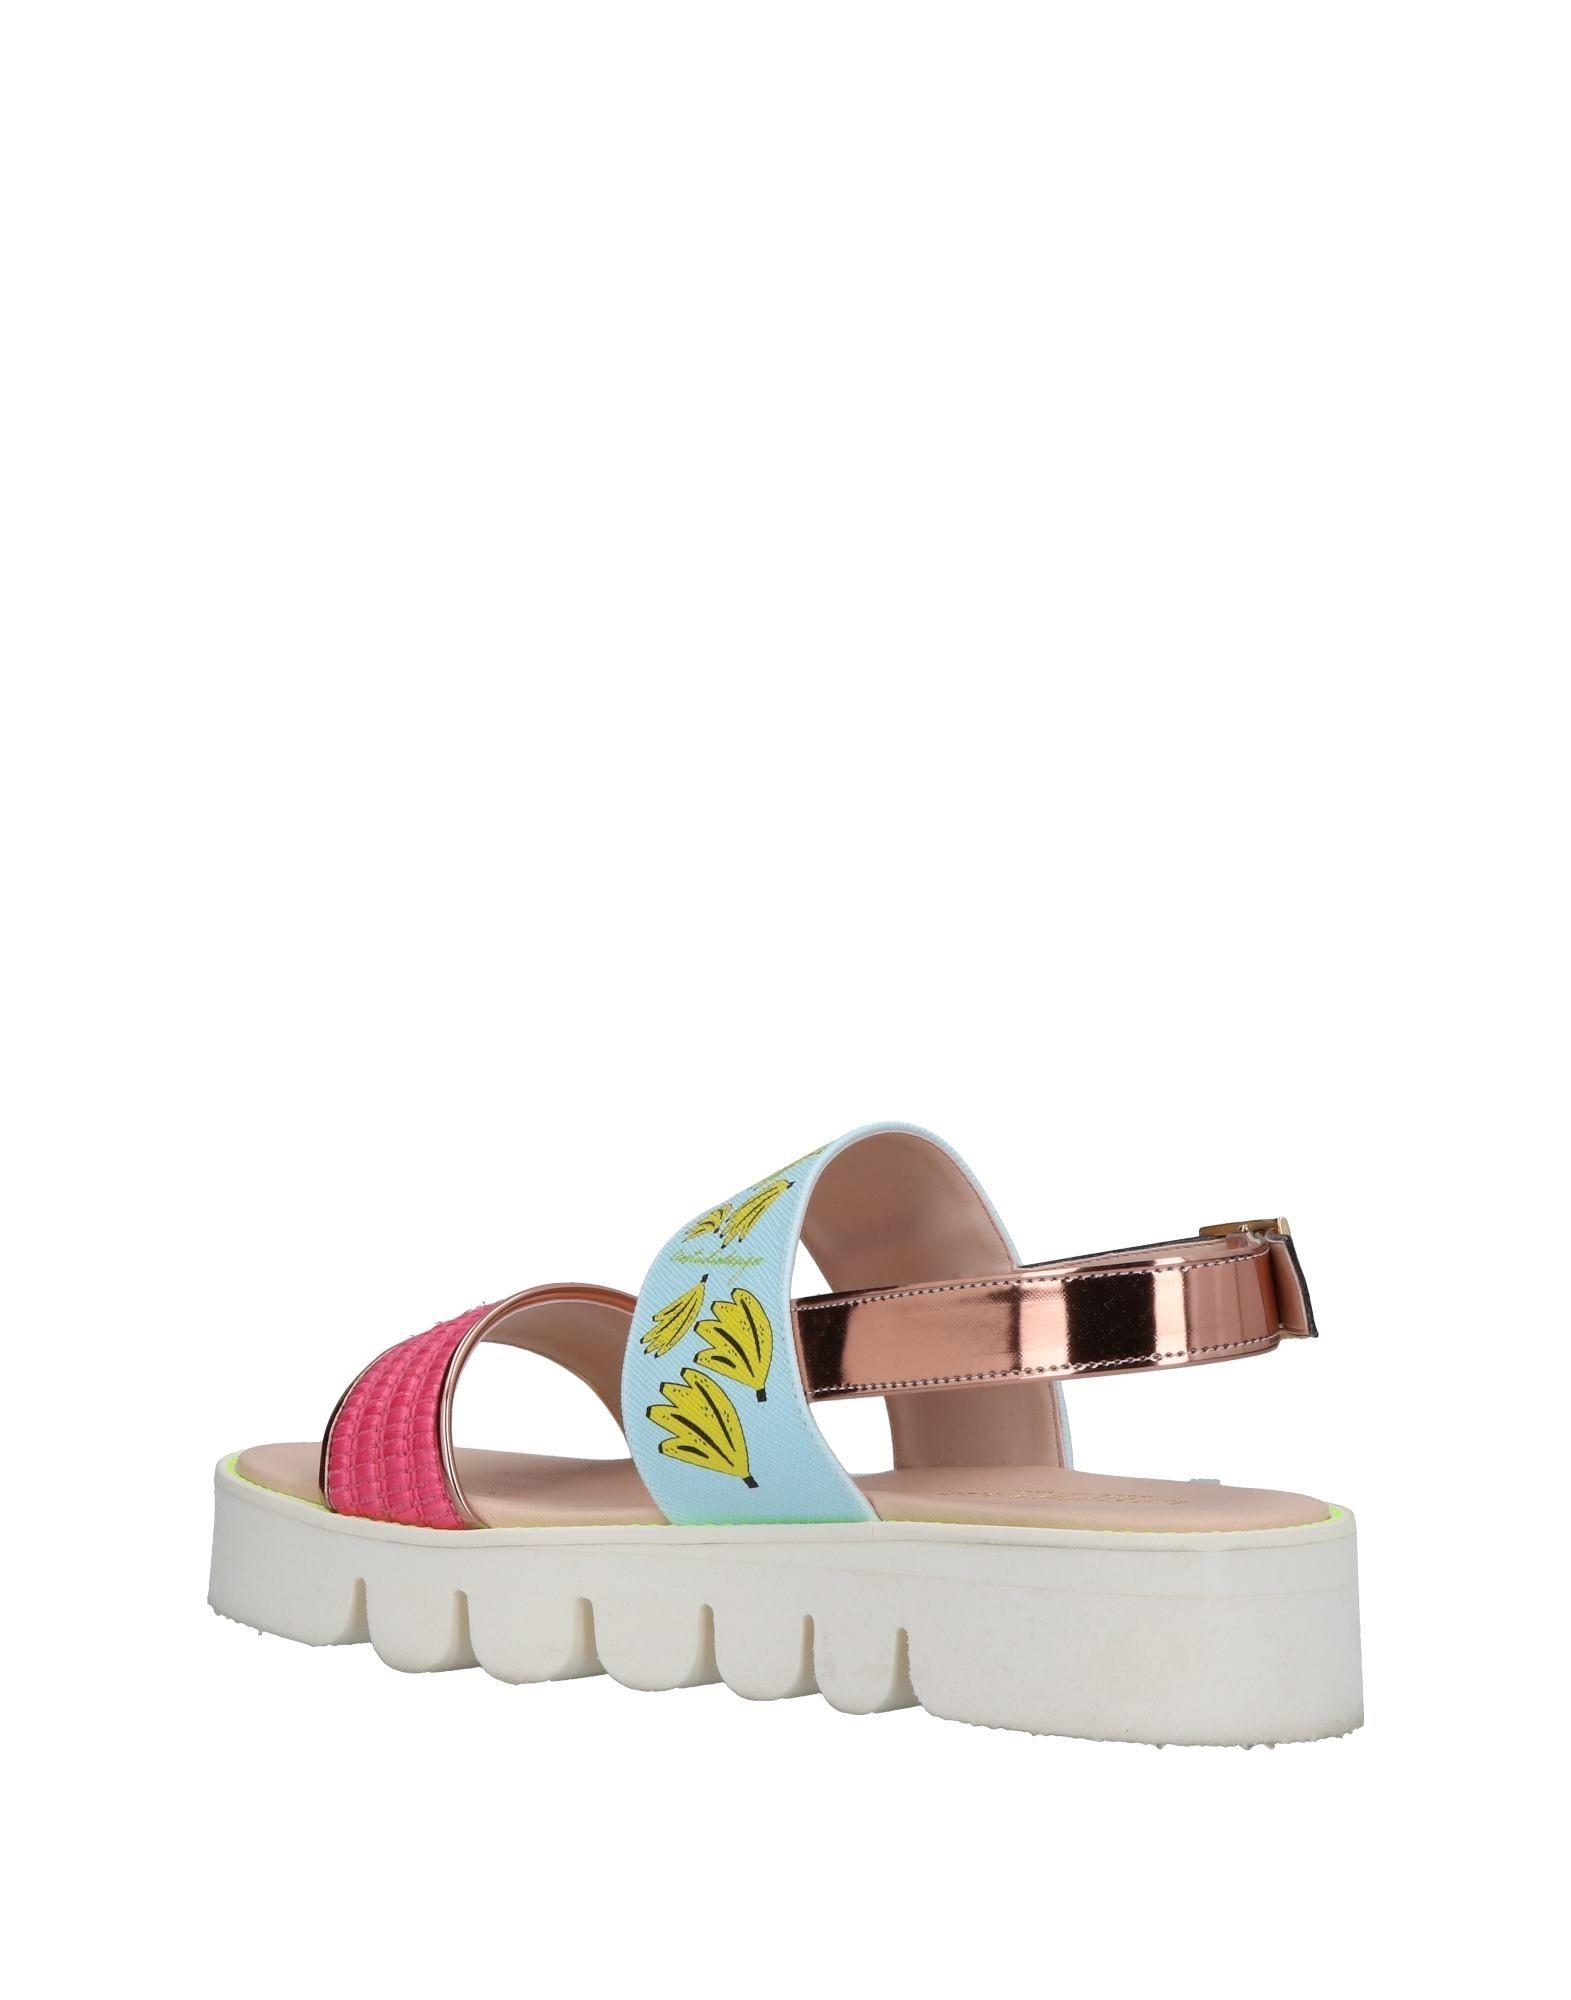 Leo Damen Studio Design Sandalen Damen Leo  11372066GL Gute Qualität beliebte Schuhe 1b2a26